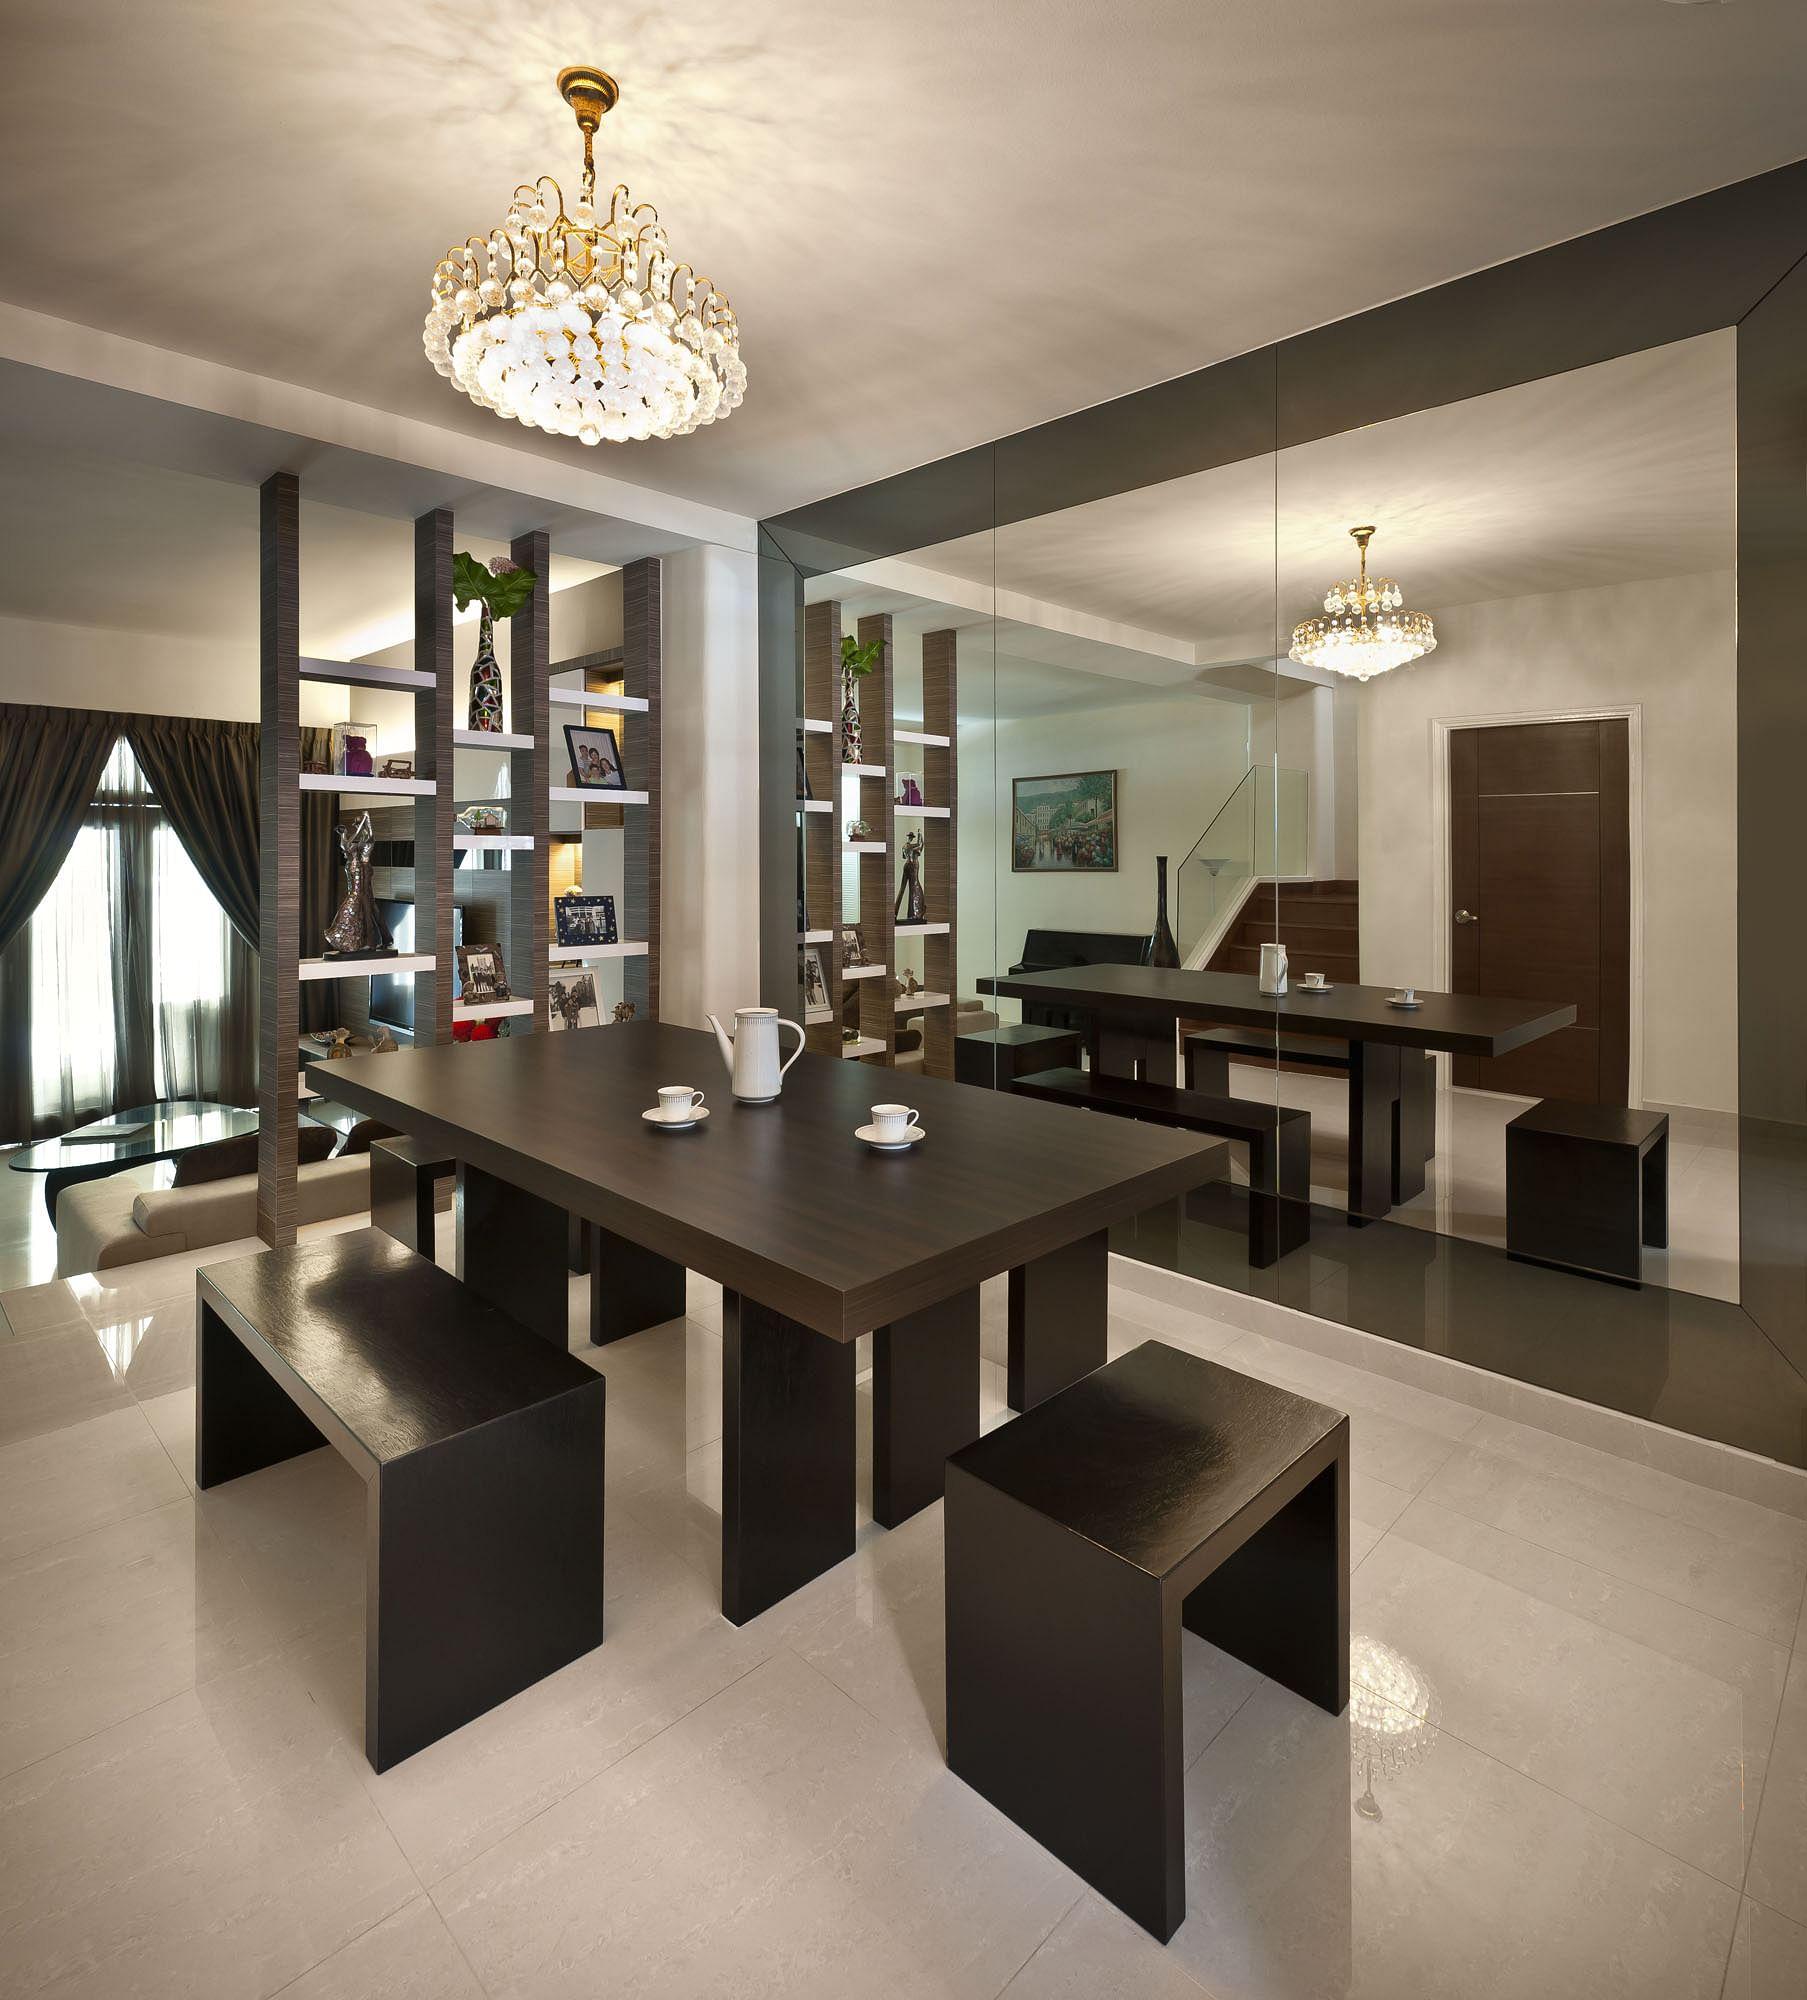 Dining Room Design Singapore 28 Images Condo Living Dining Hdb Interior Design Services Hdb